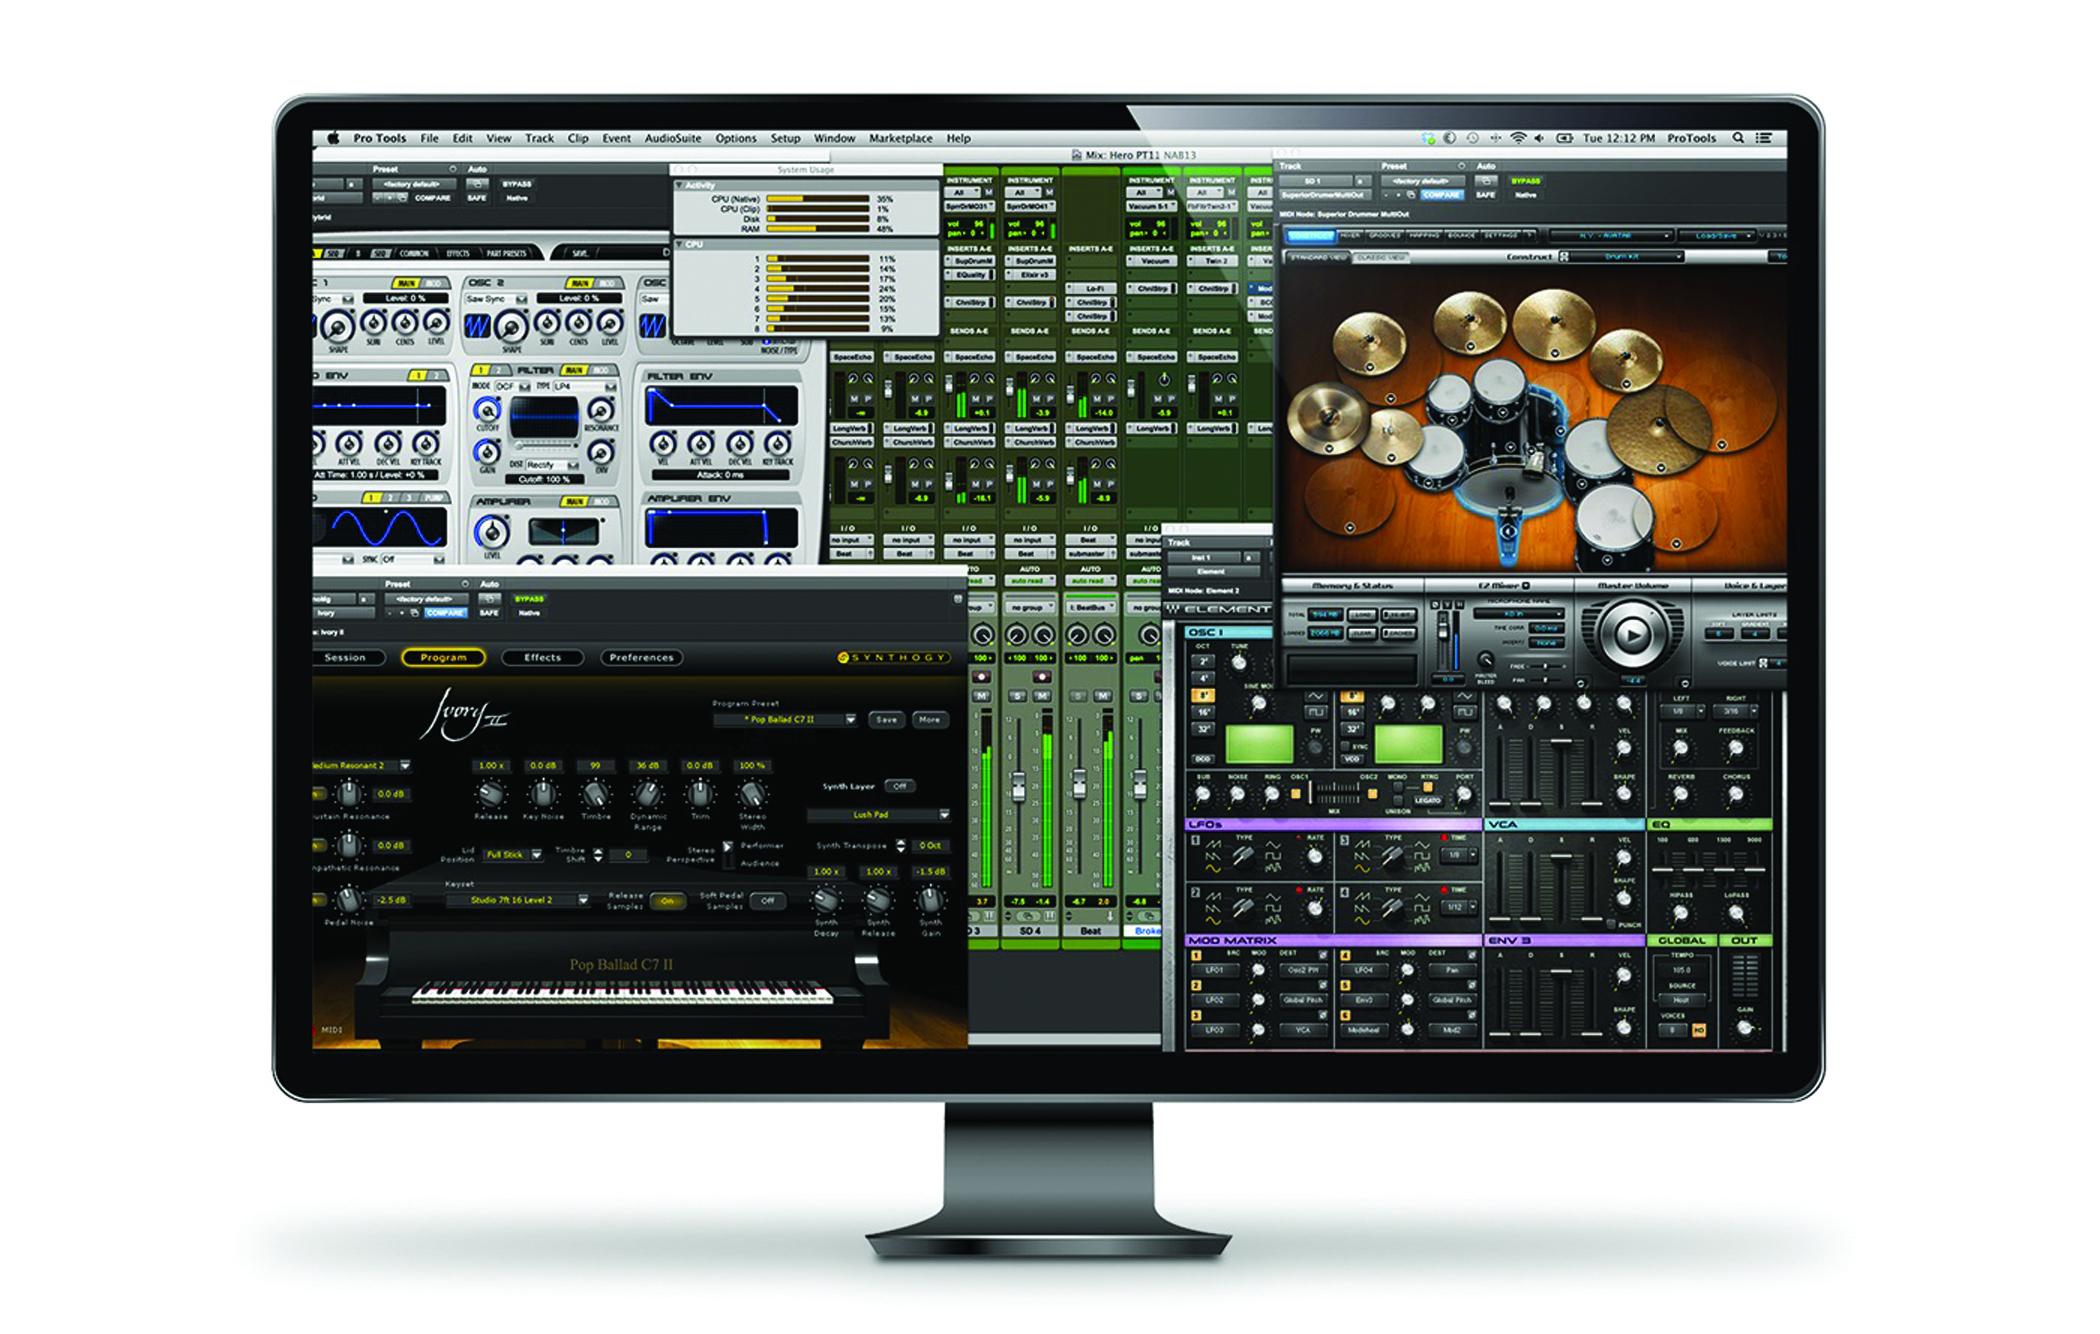 Avid Pro tools 12.5